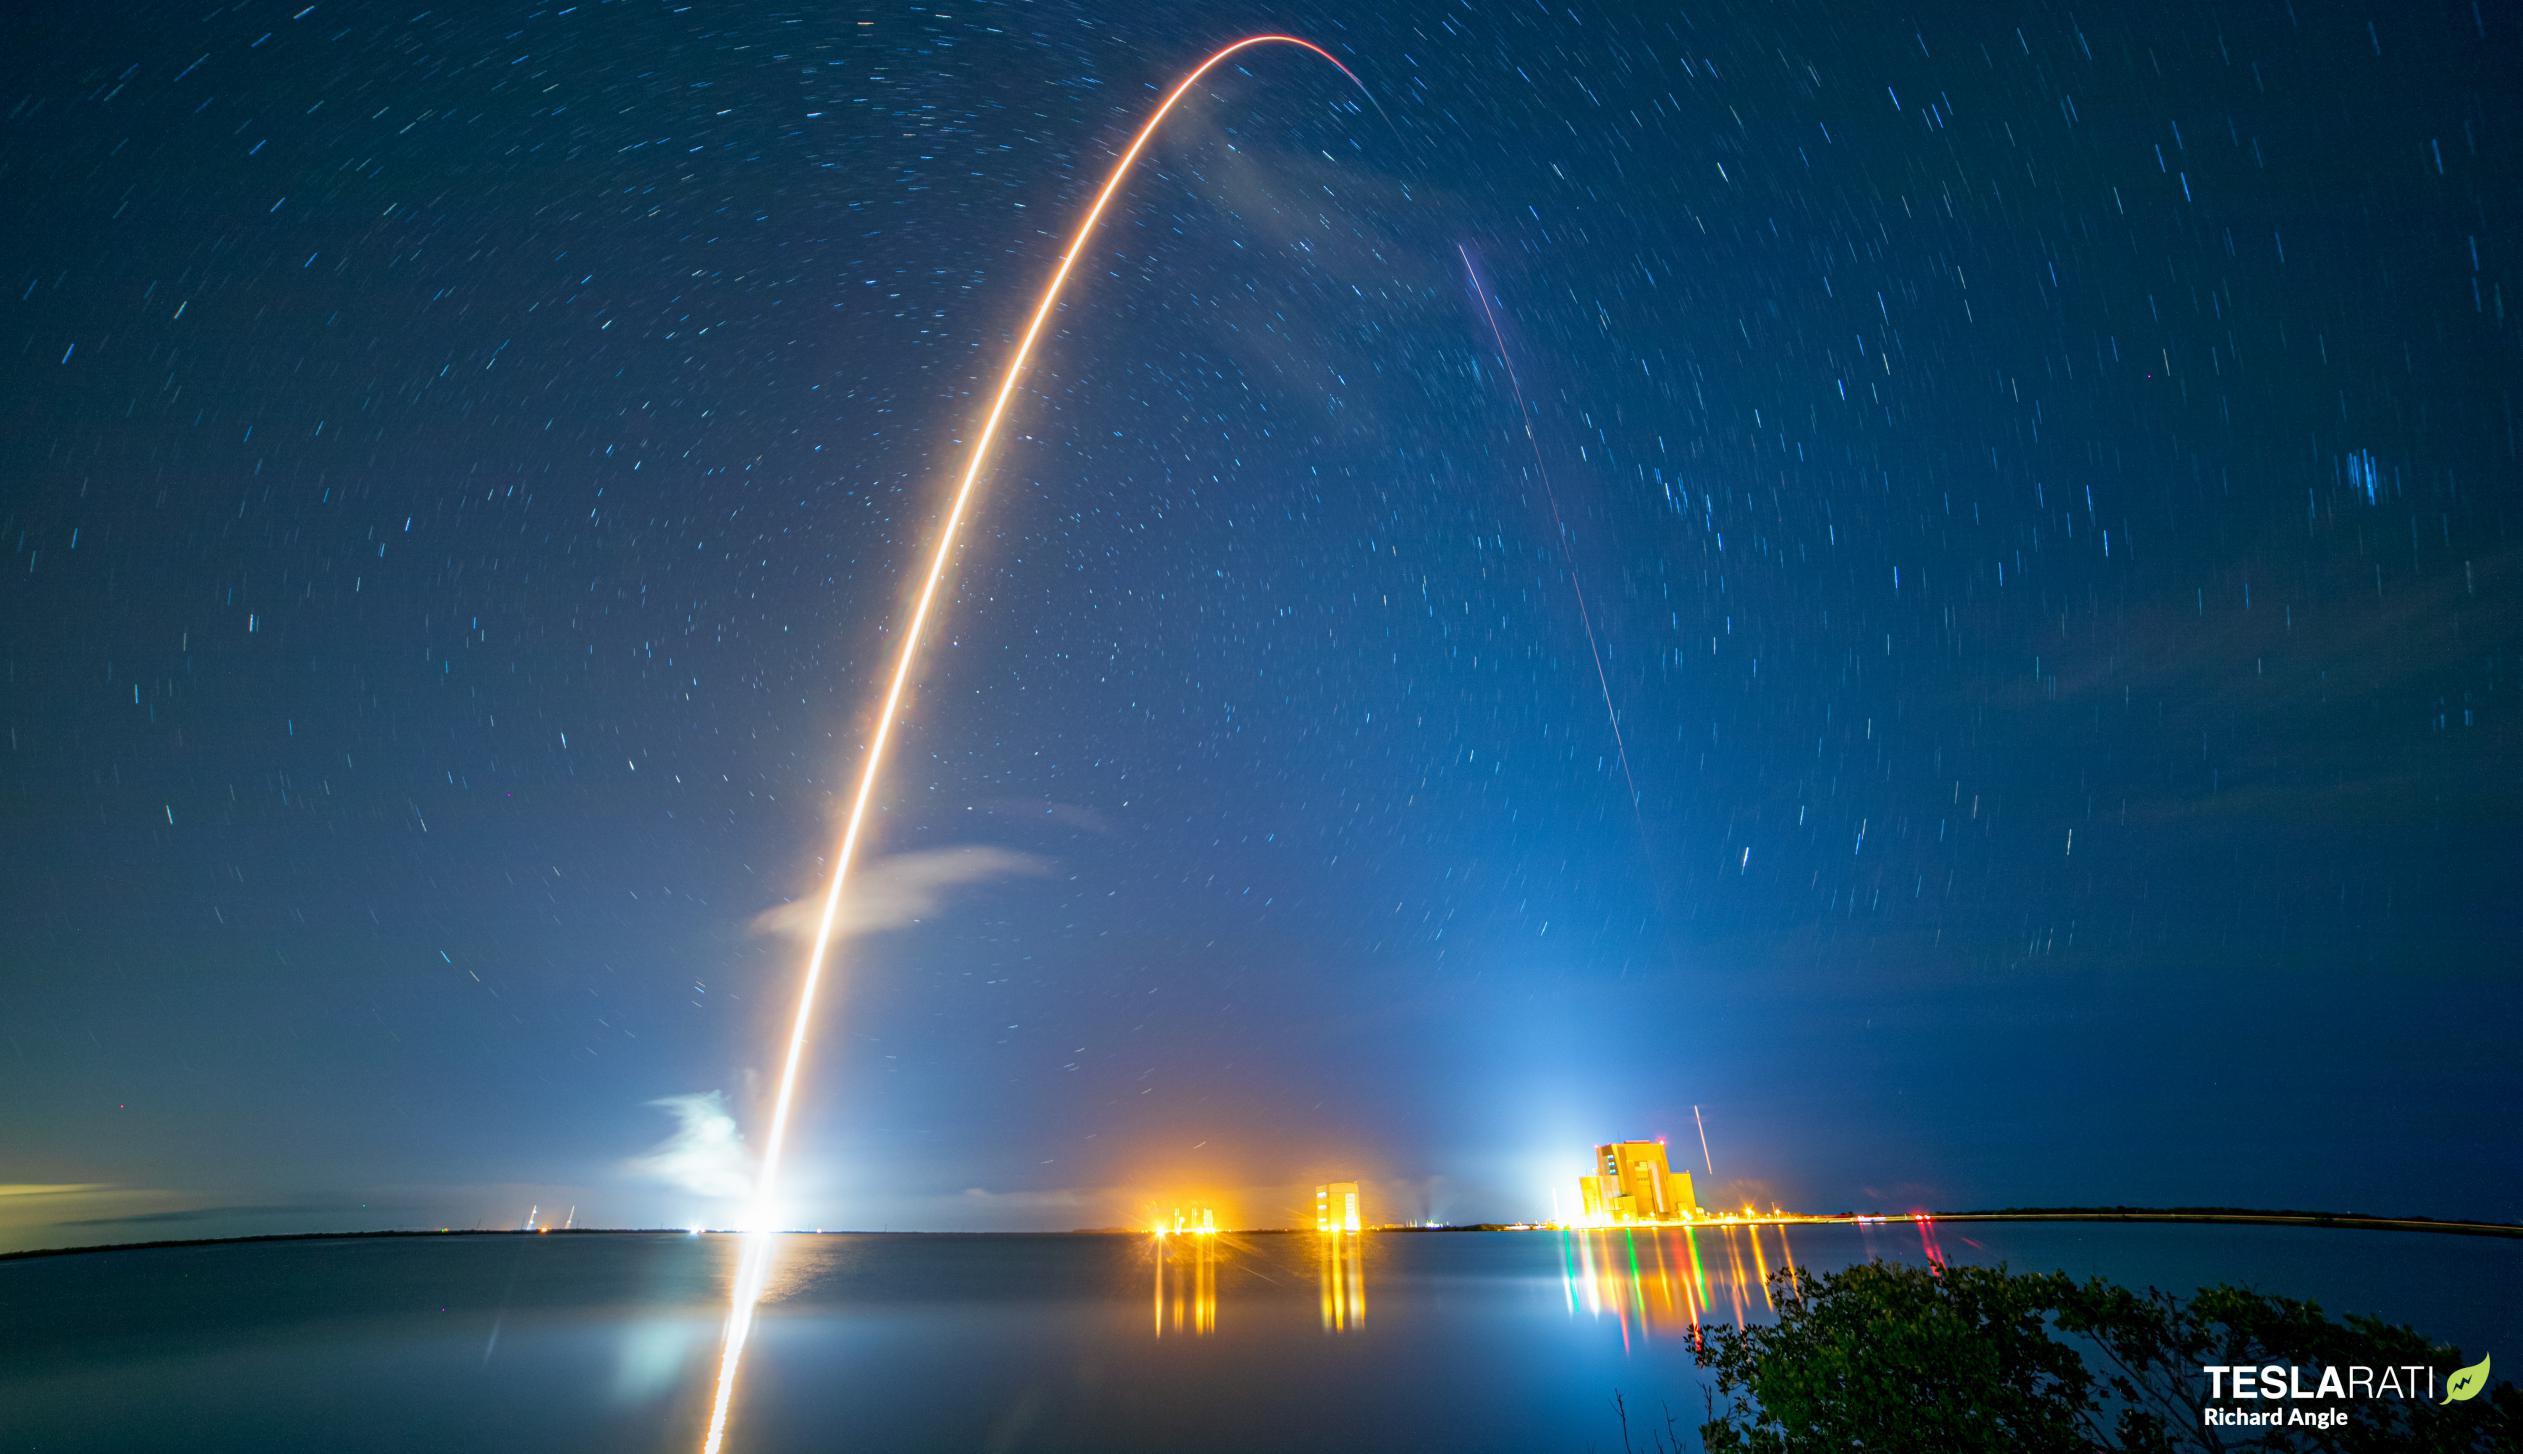 Crew-1 Crew Dragon C207 Falcon 9 B1061 39A 111520 (Richard Angle) streak 1 crop (c)